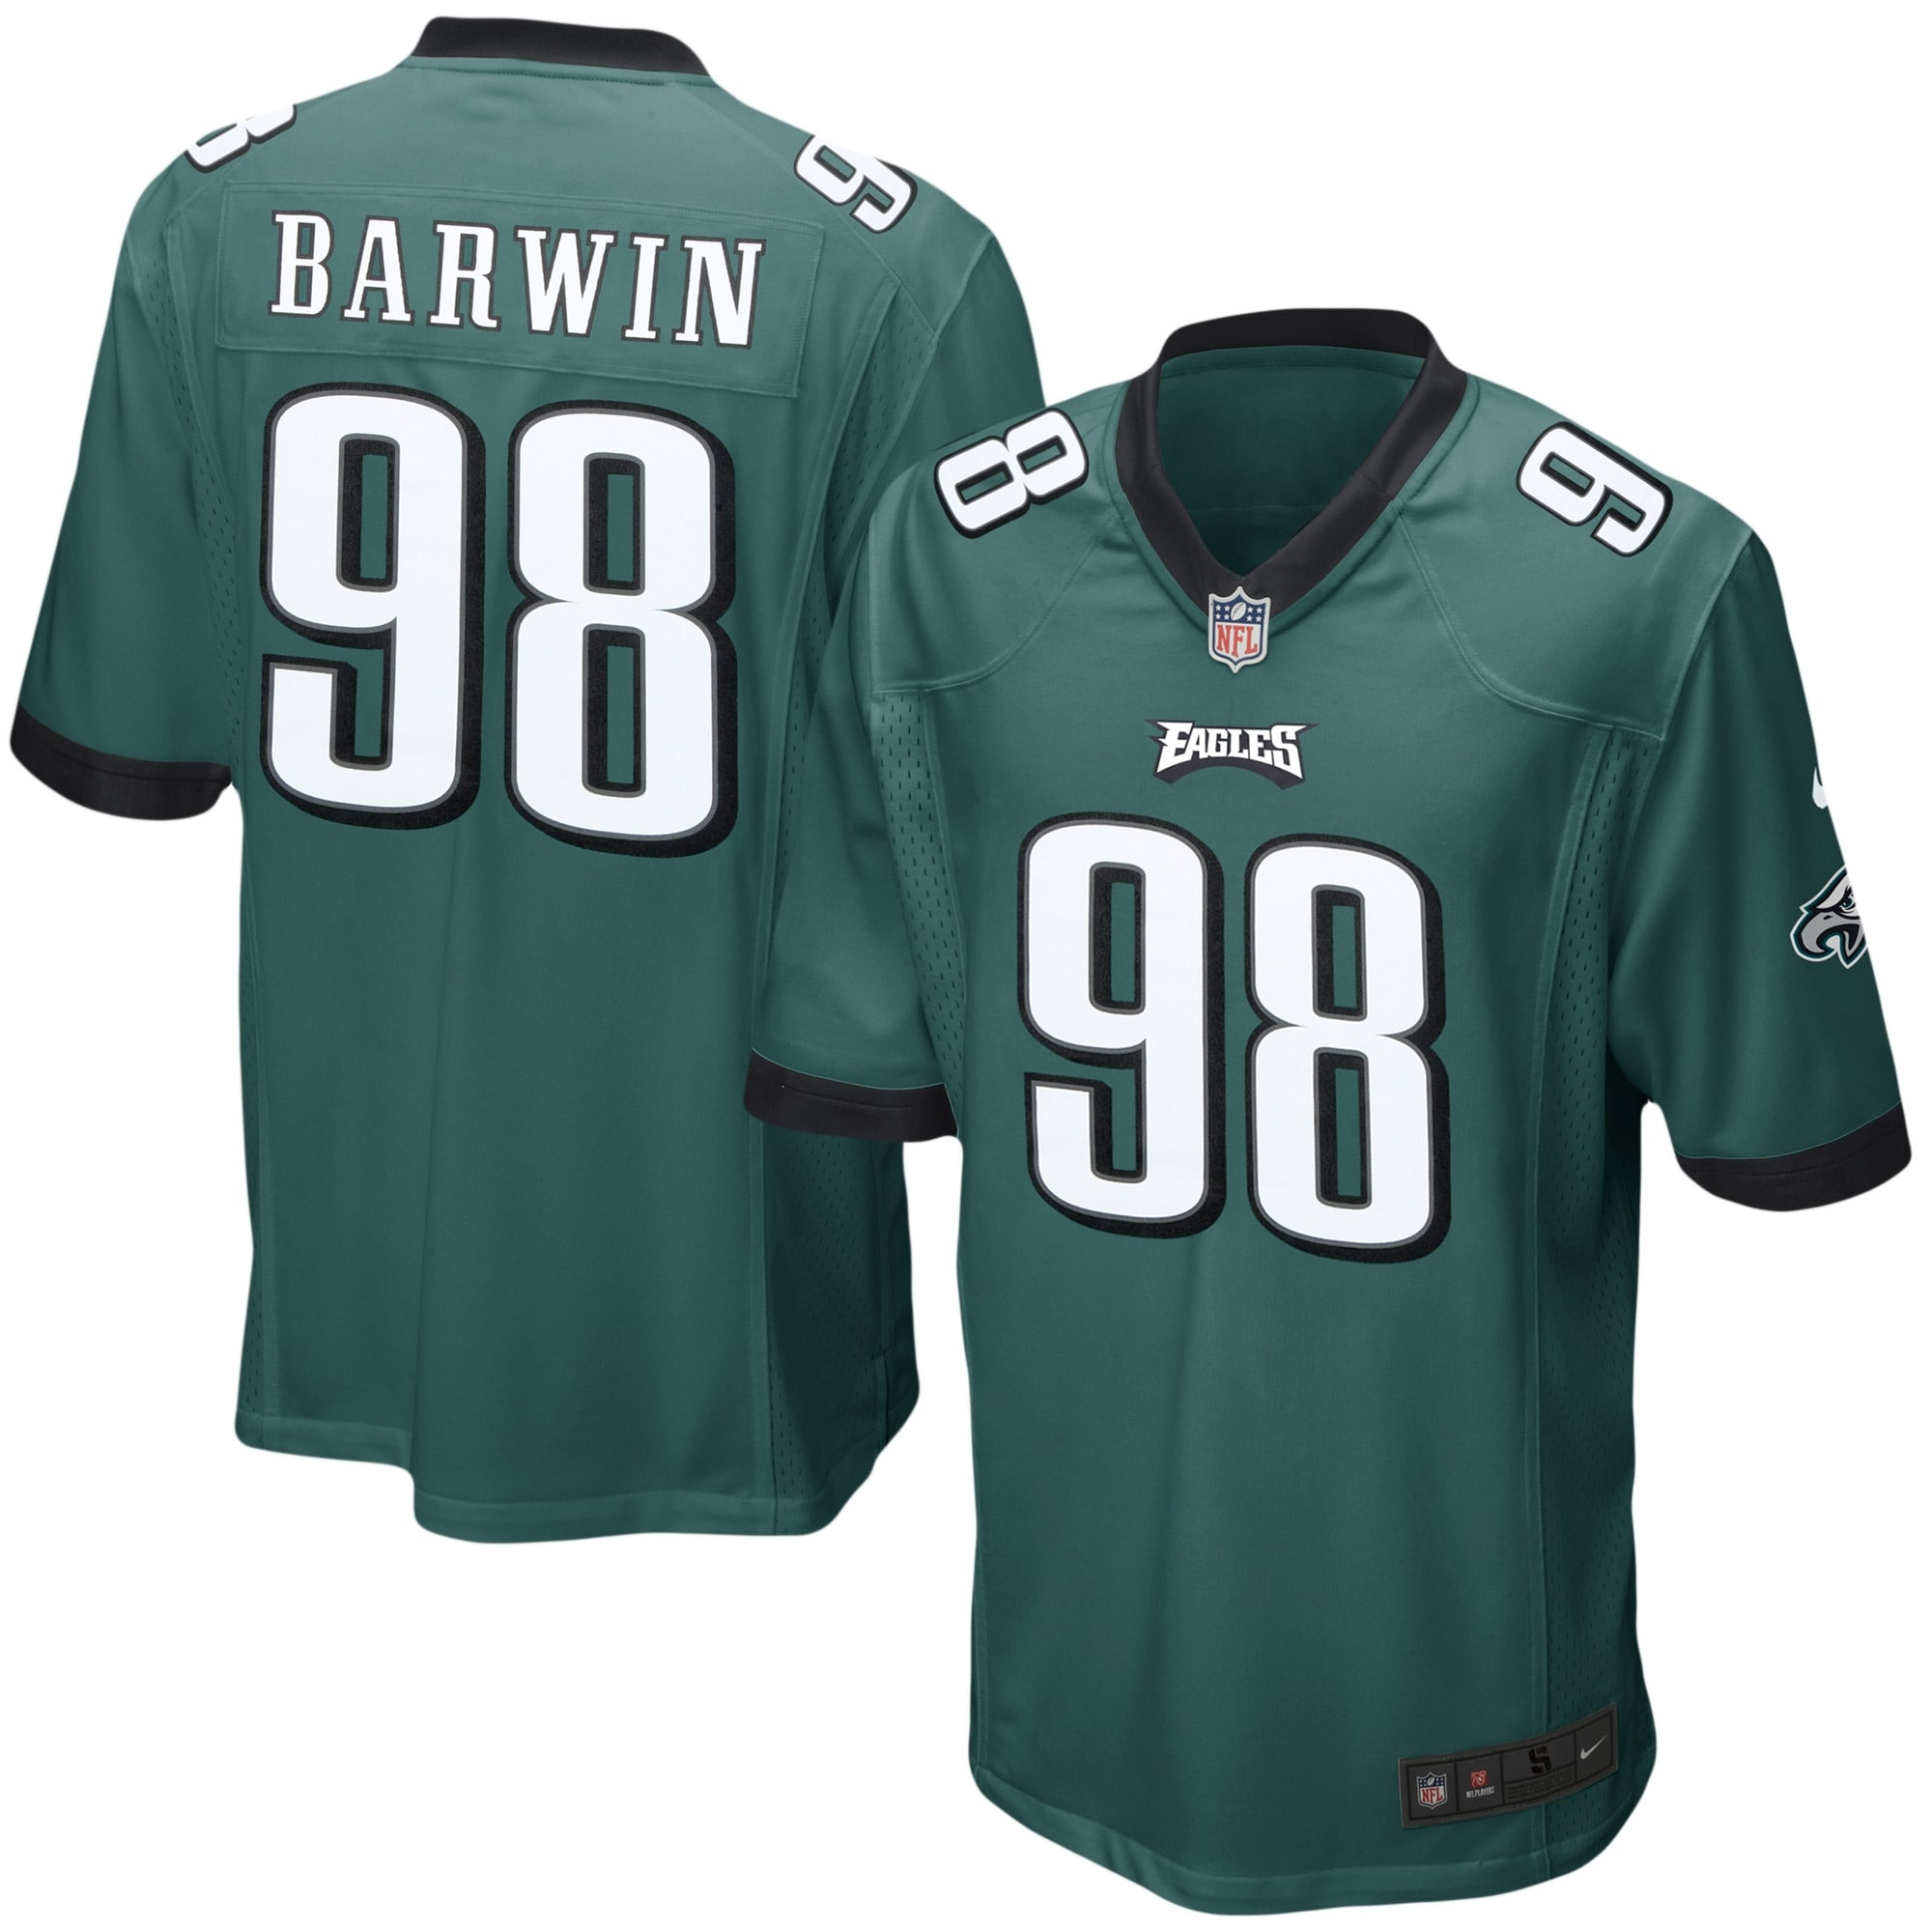 Connor Barwin Philadelphia Eagles Nike Youth Team Color Game Jersey - Midnight Green - Walmart.com